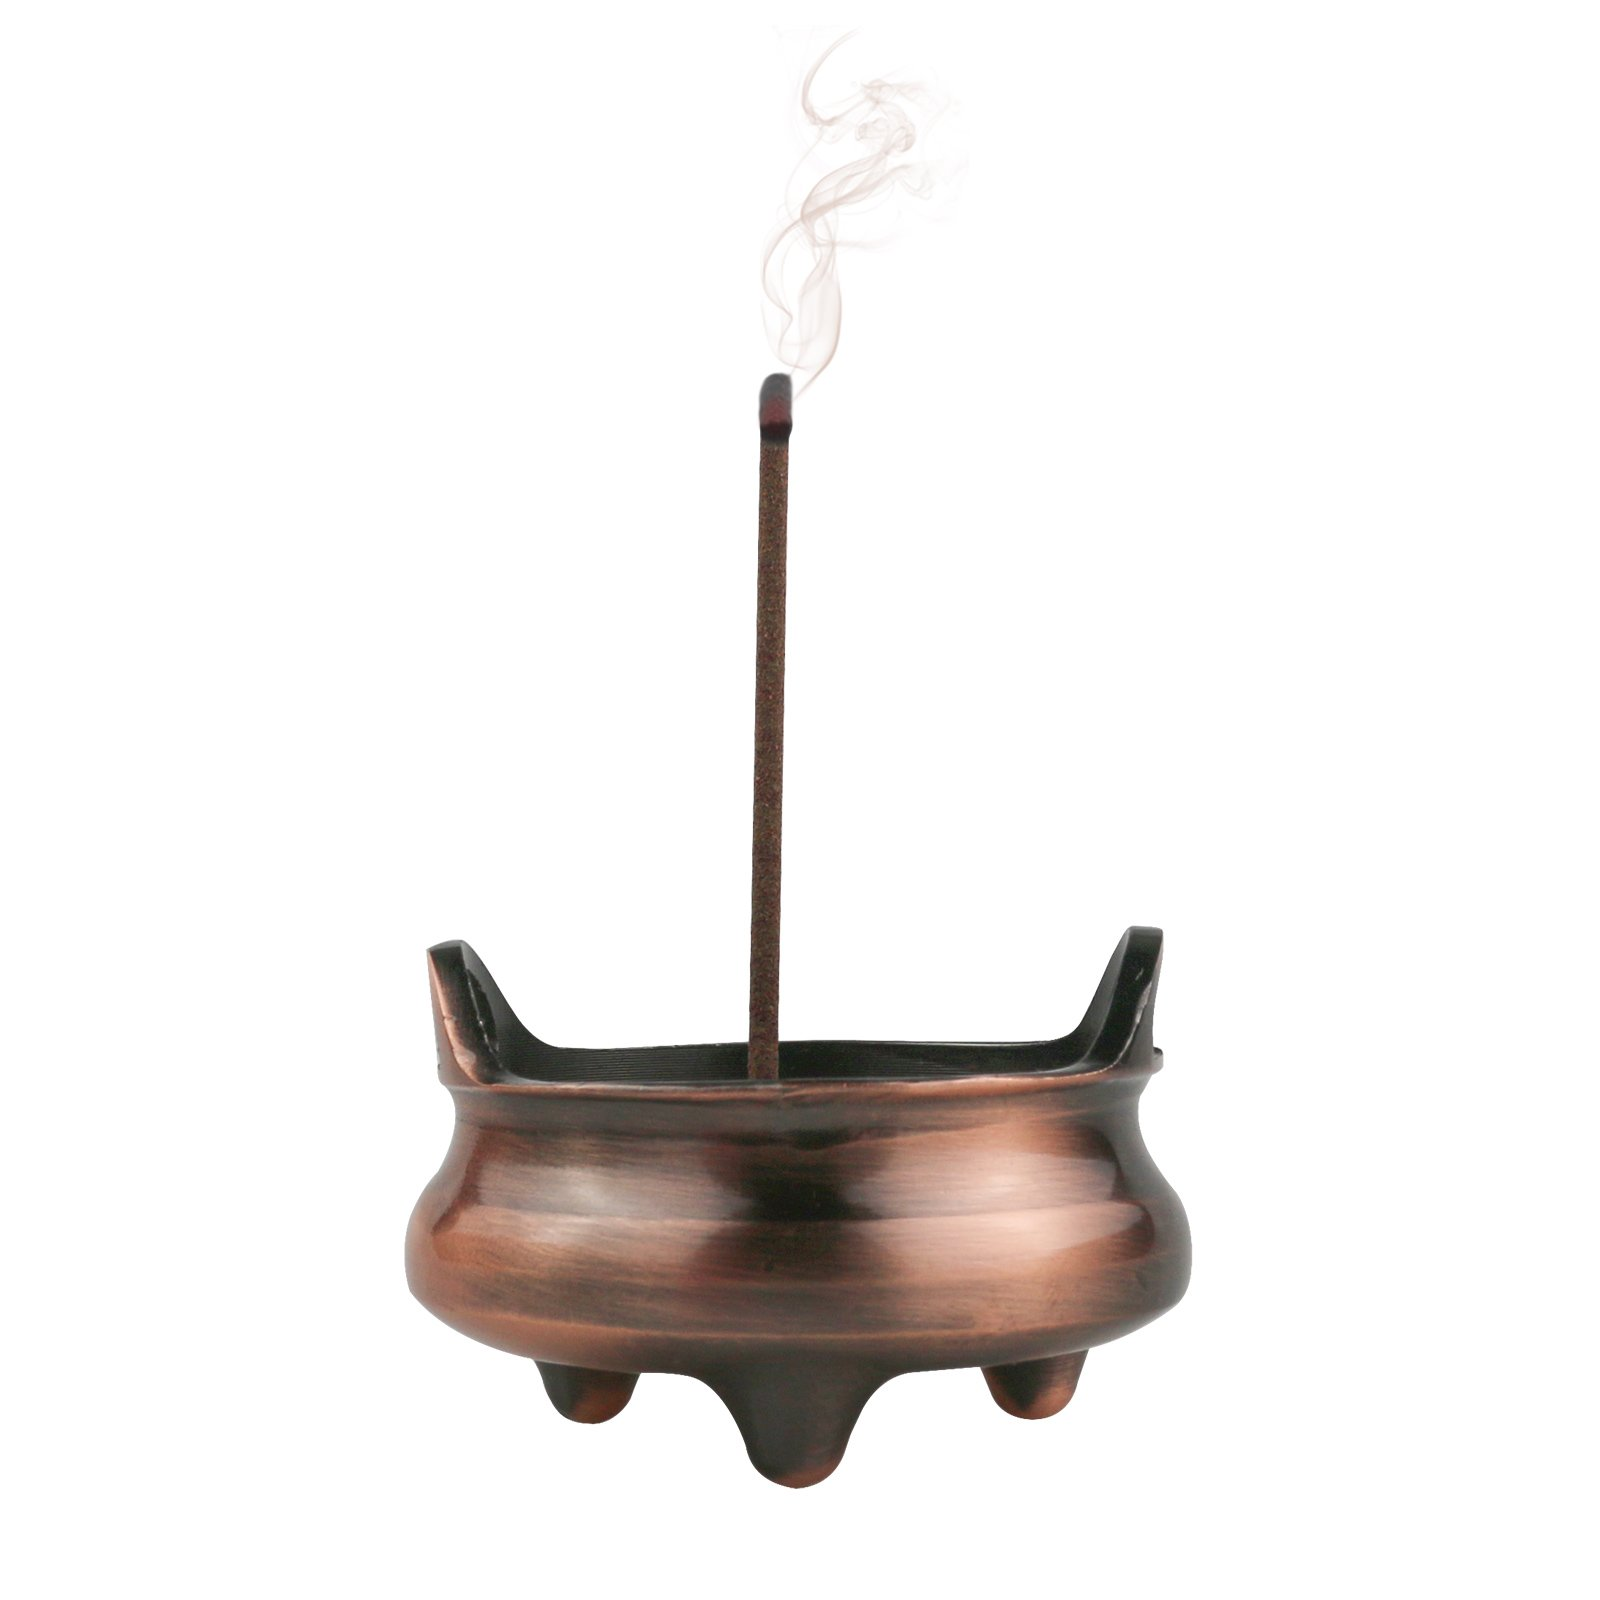 McDuets Incense Burner Holder | 3 Feet and 2 Ears Copper Zinc Alloy Small Censer | 7 Holes Support 1mm-4mm Diameter Sticks | for Cones | for Boys Grils Men Women Grandma Grandpa